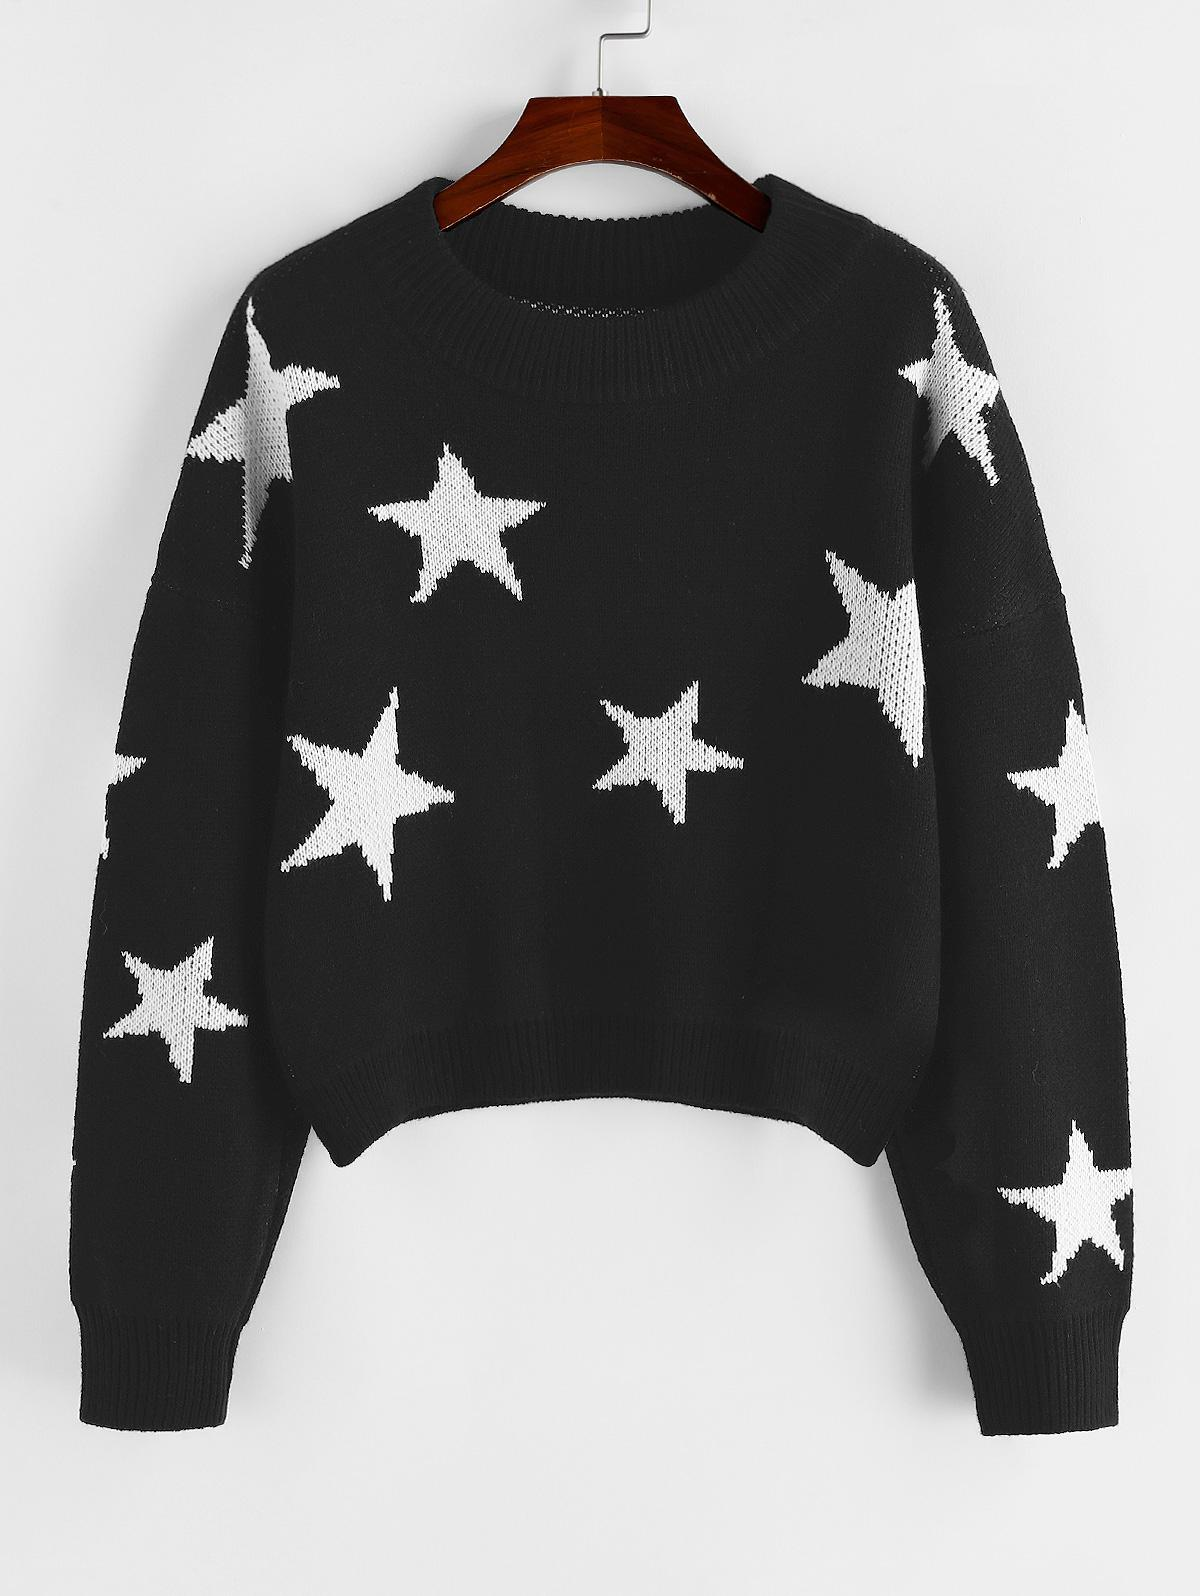 ZAFUL Star Drop Shoulder Jumper Sweater